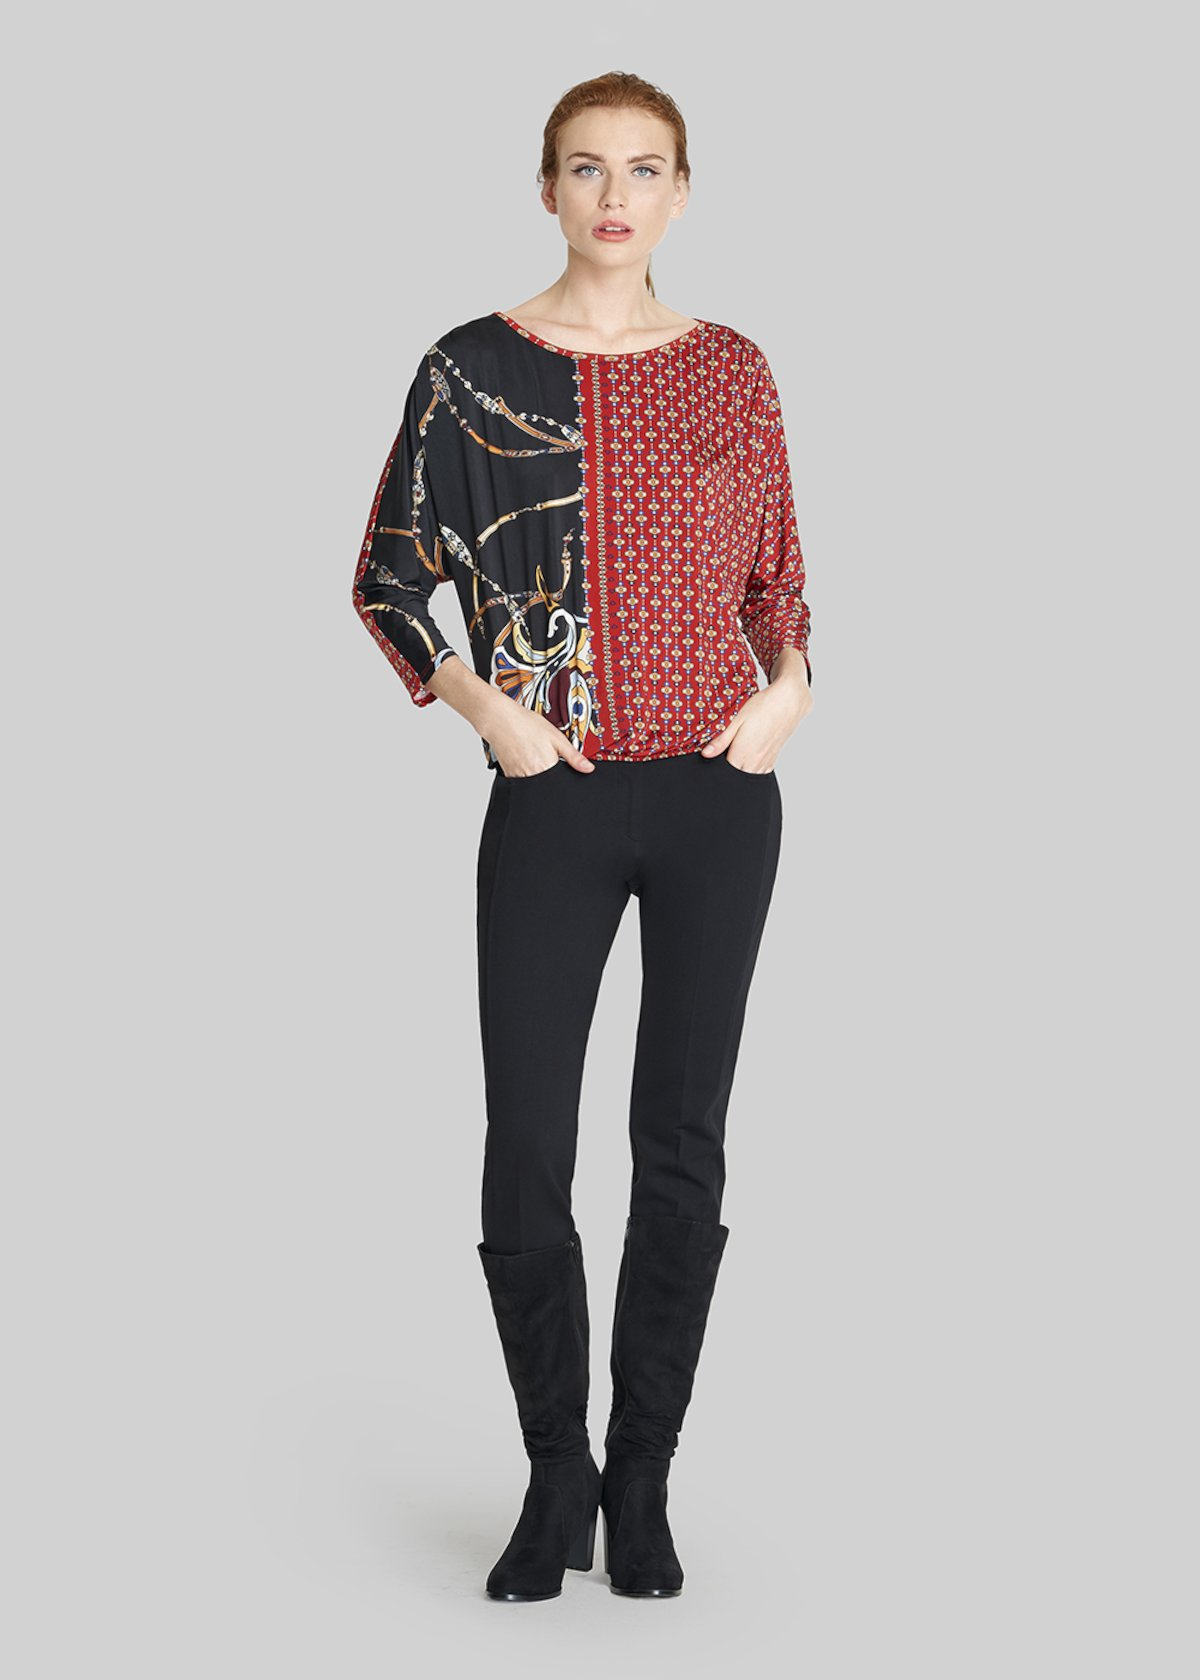 Semira shirt, egg model with 7/8 sleeve